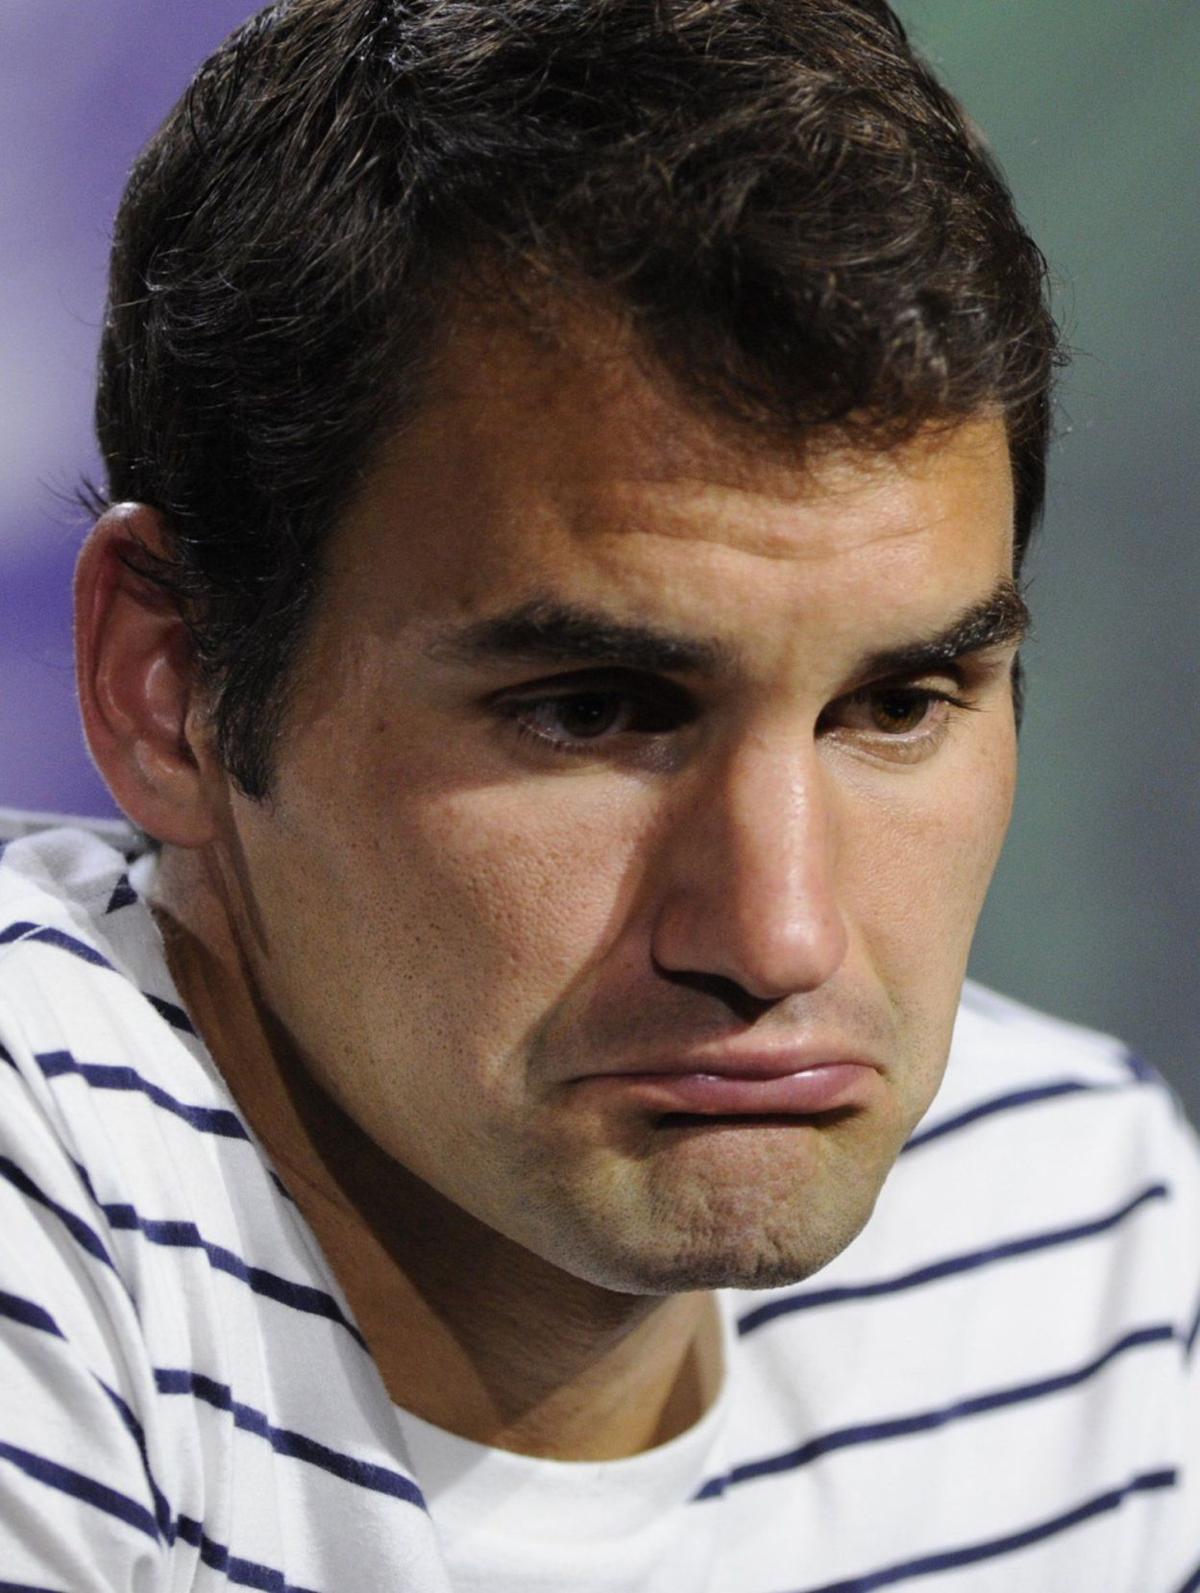 Federer upset in 2nd round at Wimbledon